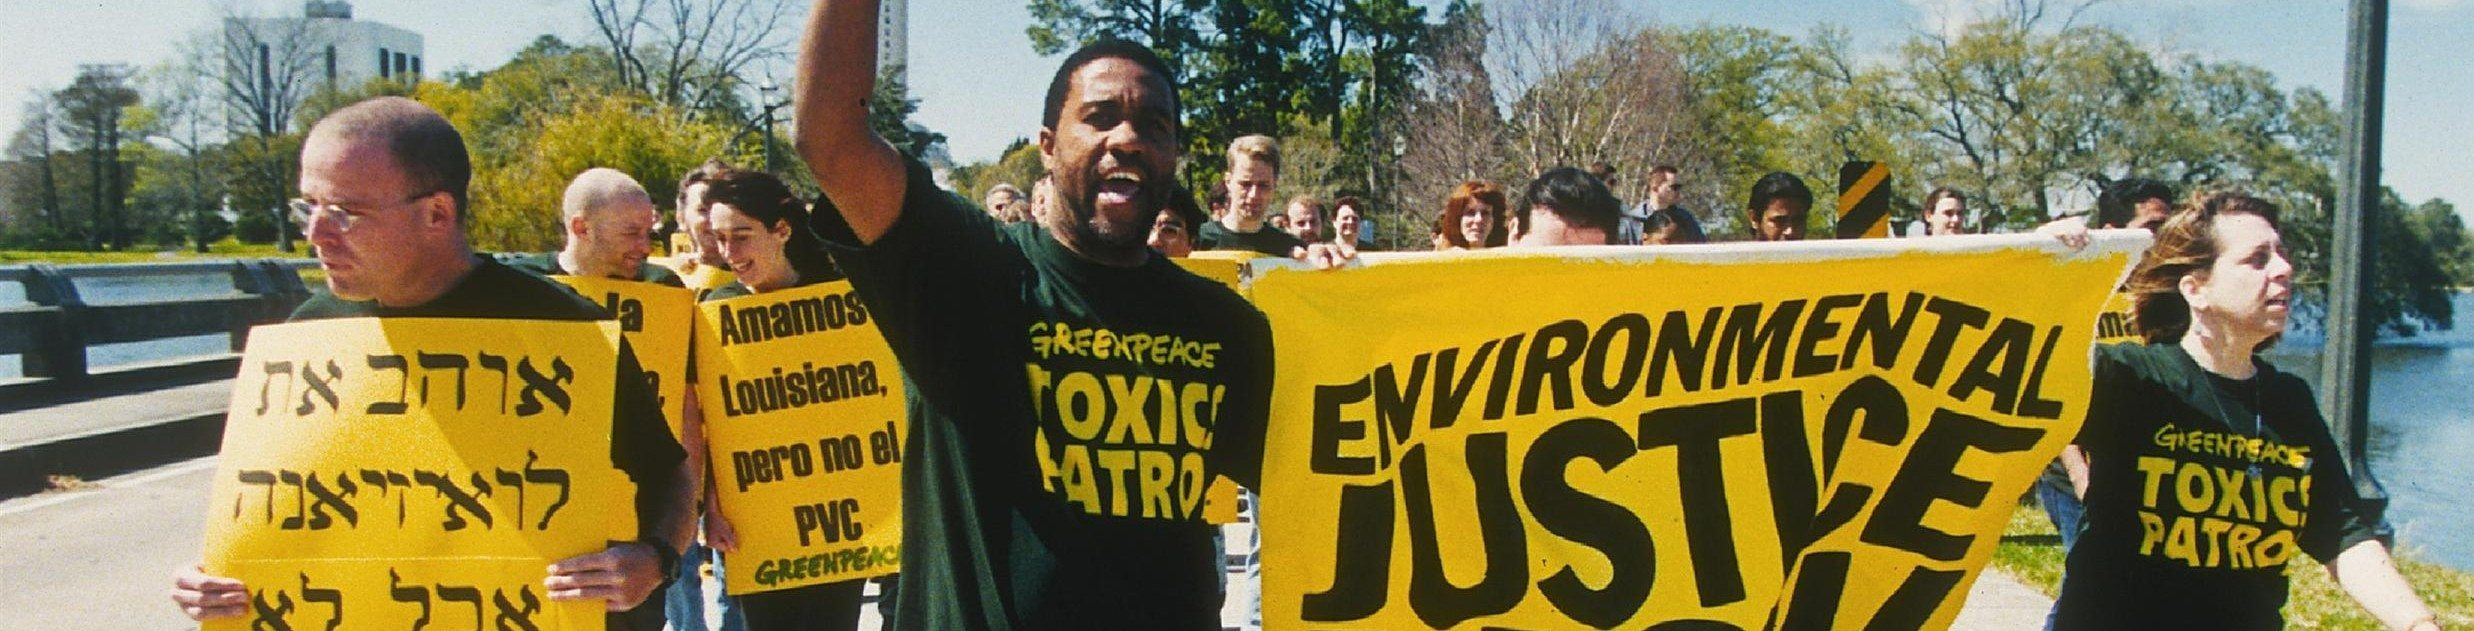 Toxic Patrol in Baton Rouge